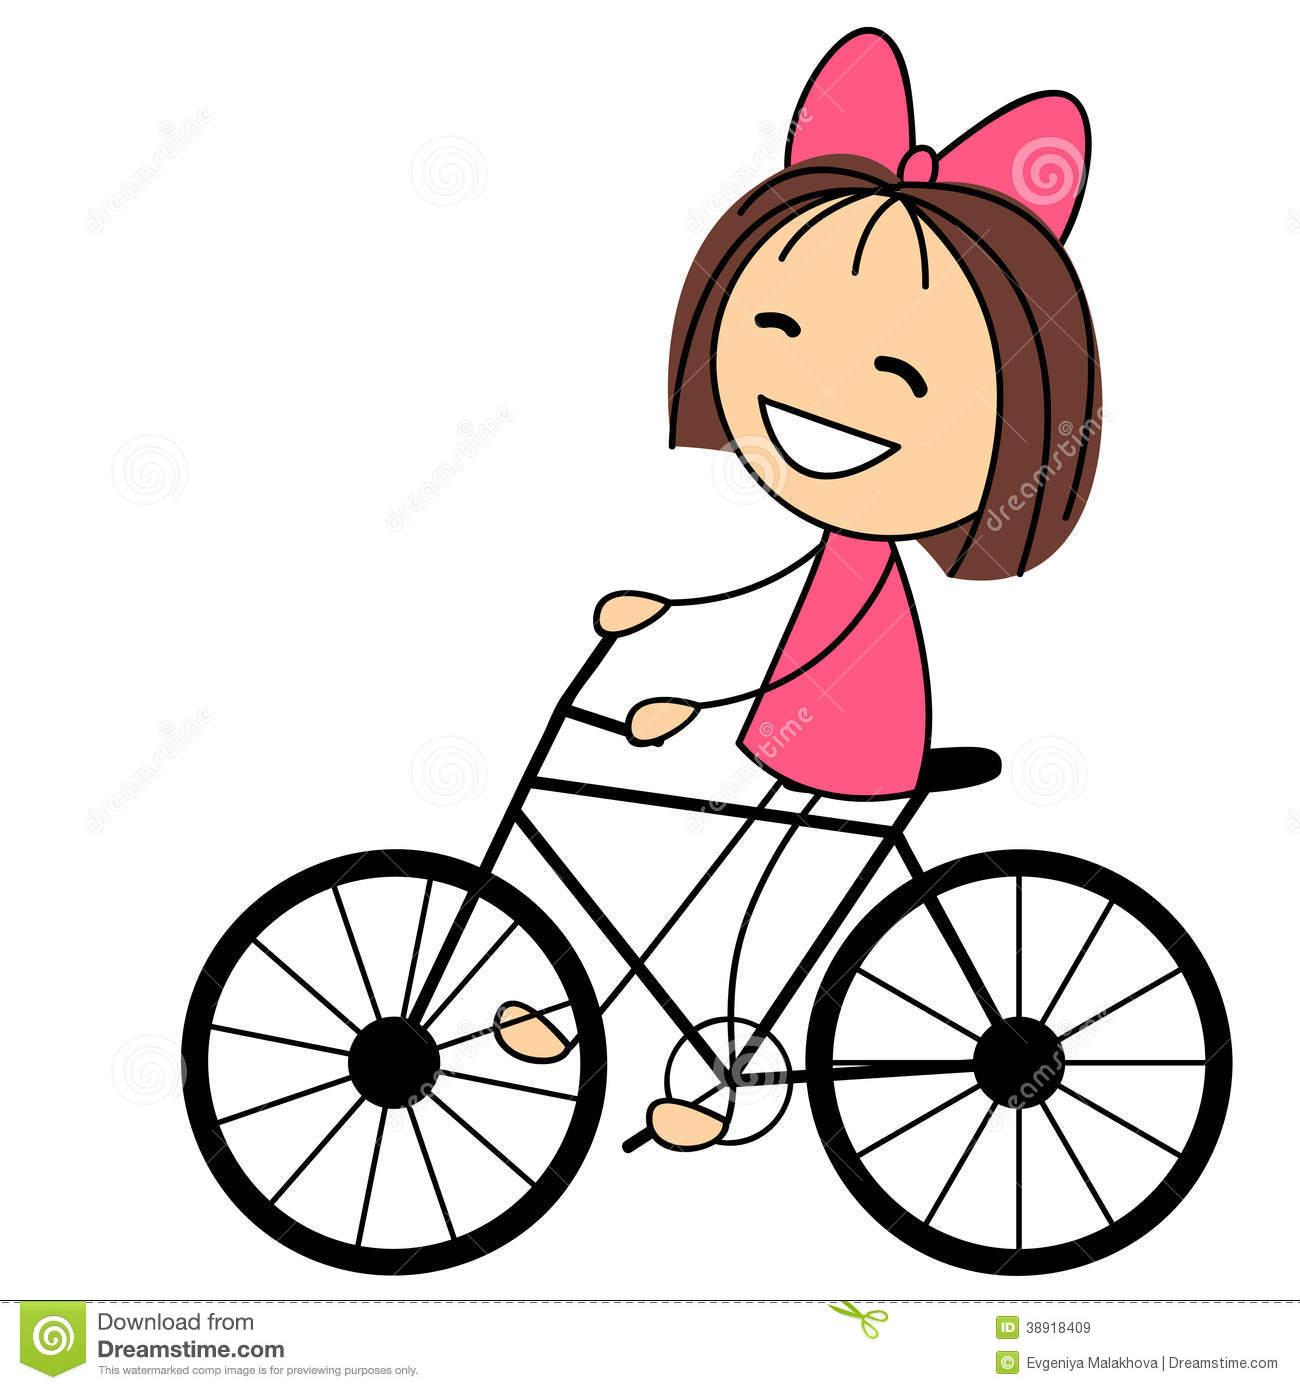 Kind auf fahrrad clipart jpg library library Frau auf fahrrad clipart - ClipartFest jpg library library